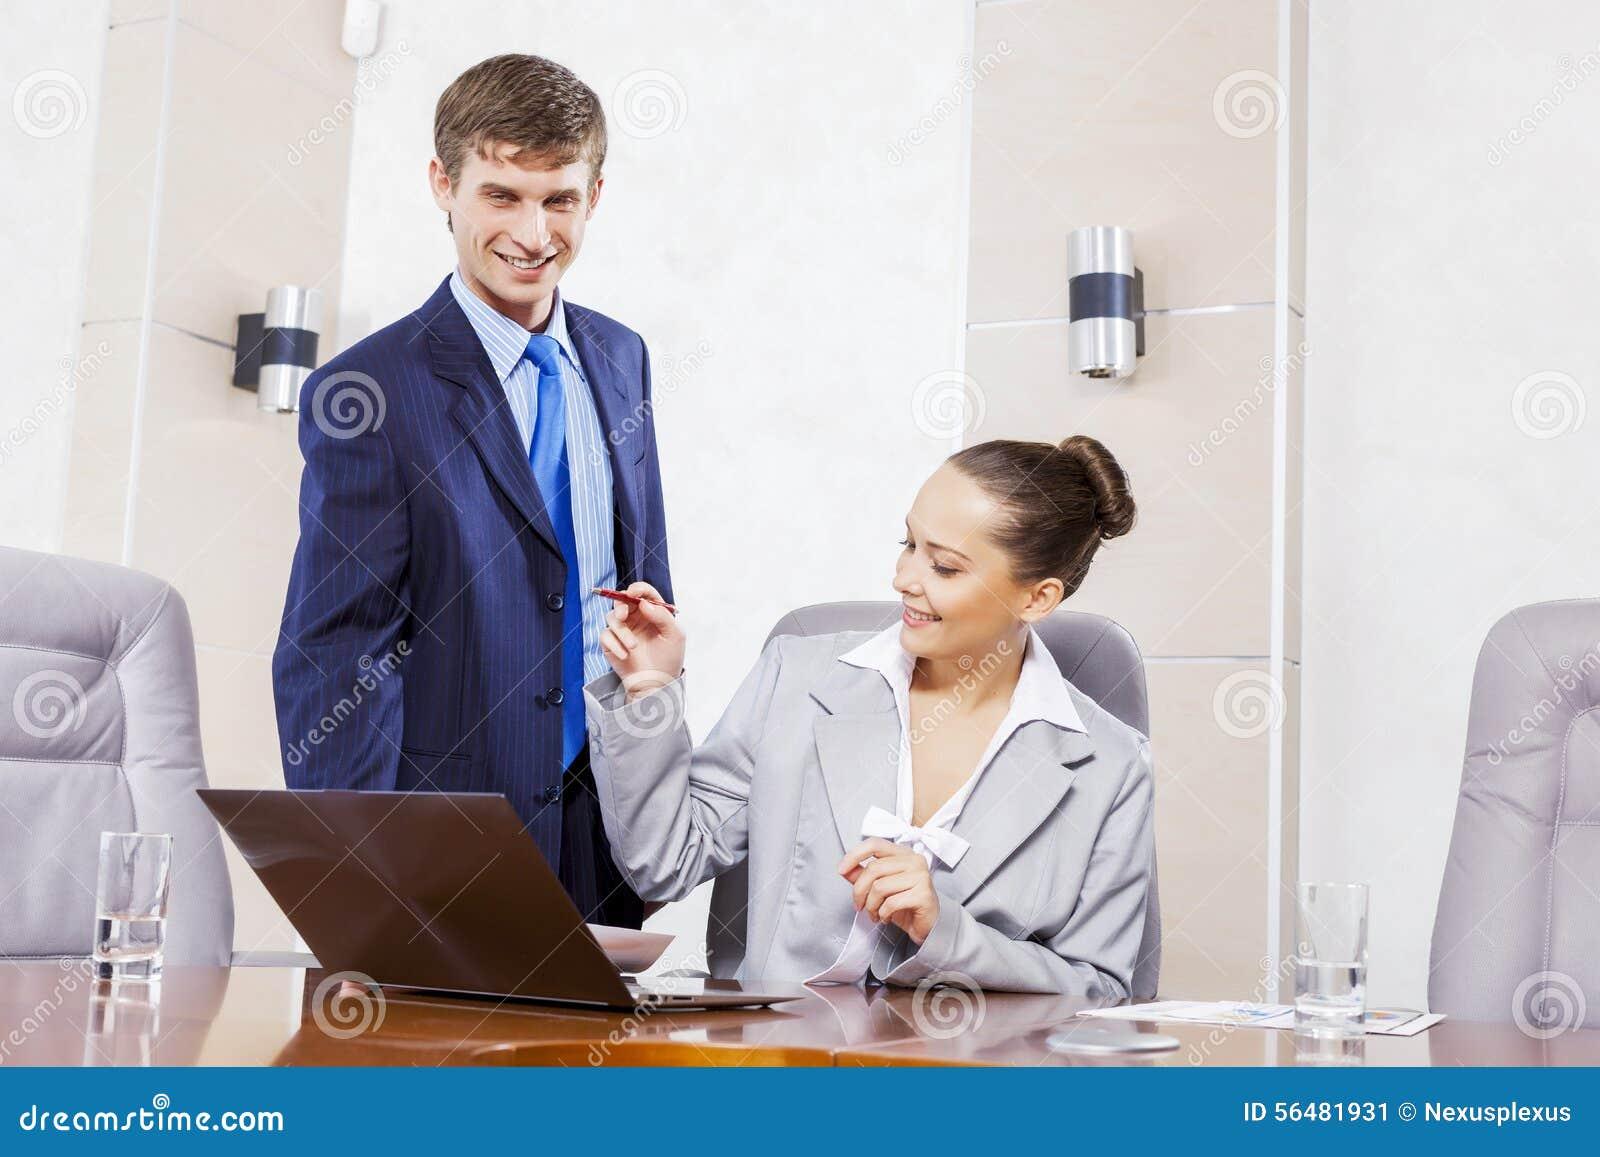 Moments de travail de bureau